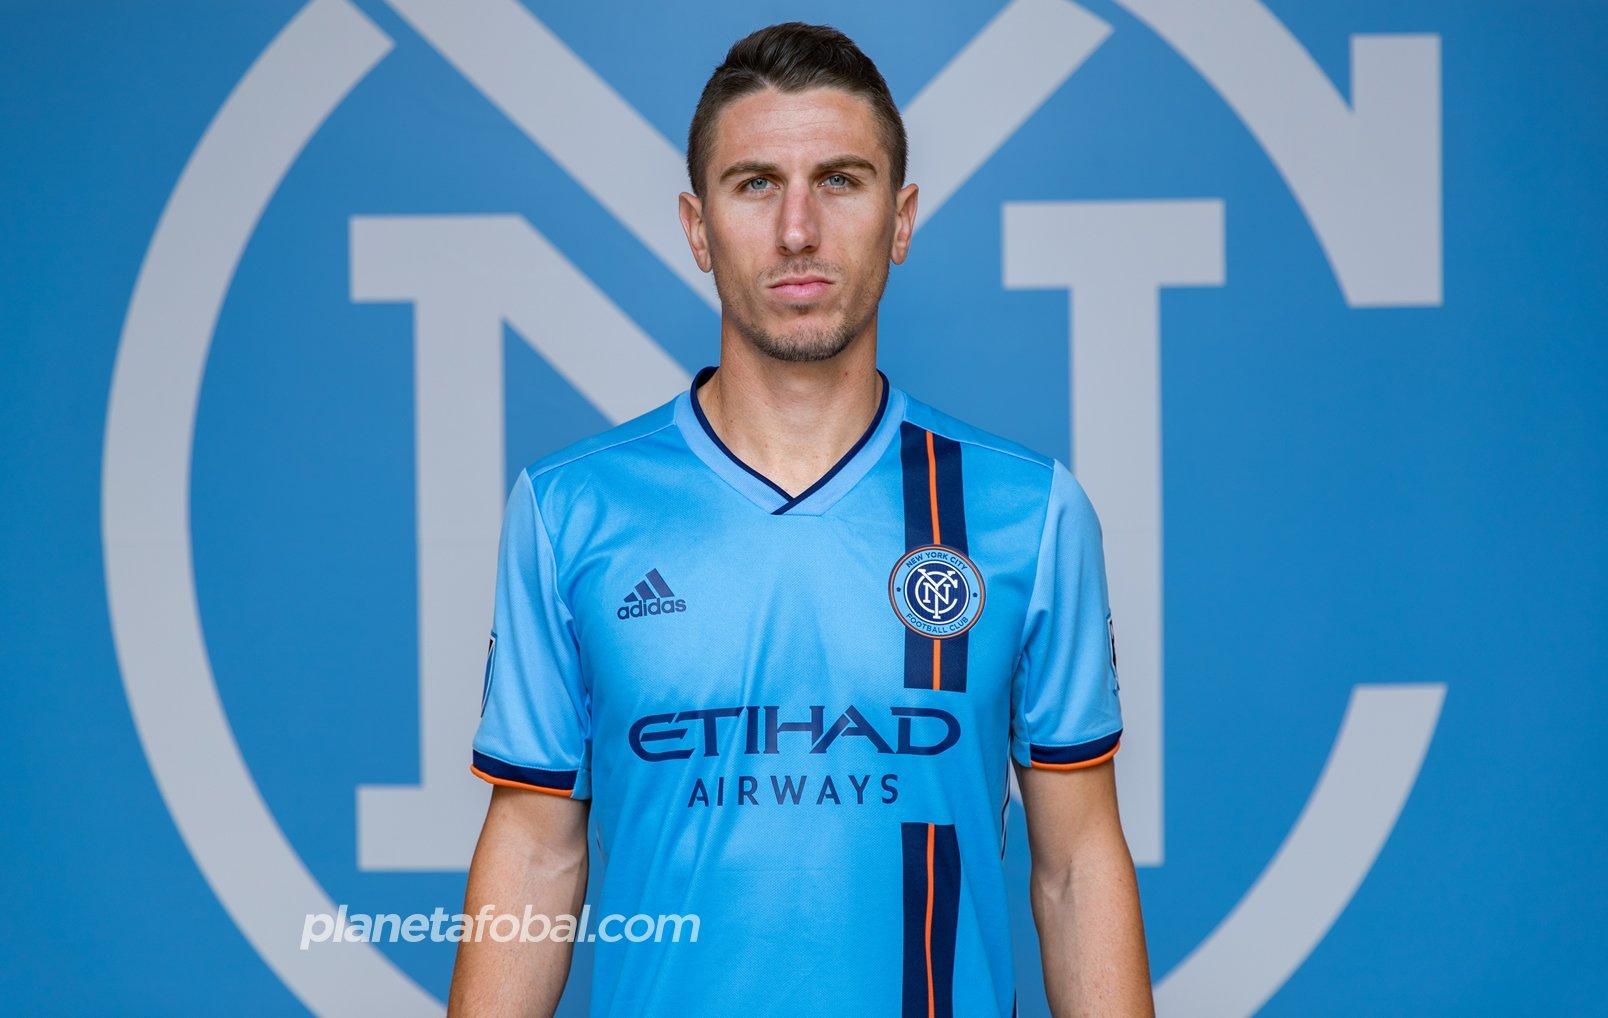 Camiseta titular Adidas del New York City 2019/20   Imagen Web Oficial